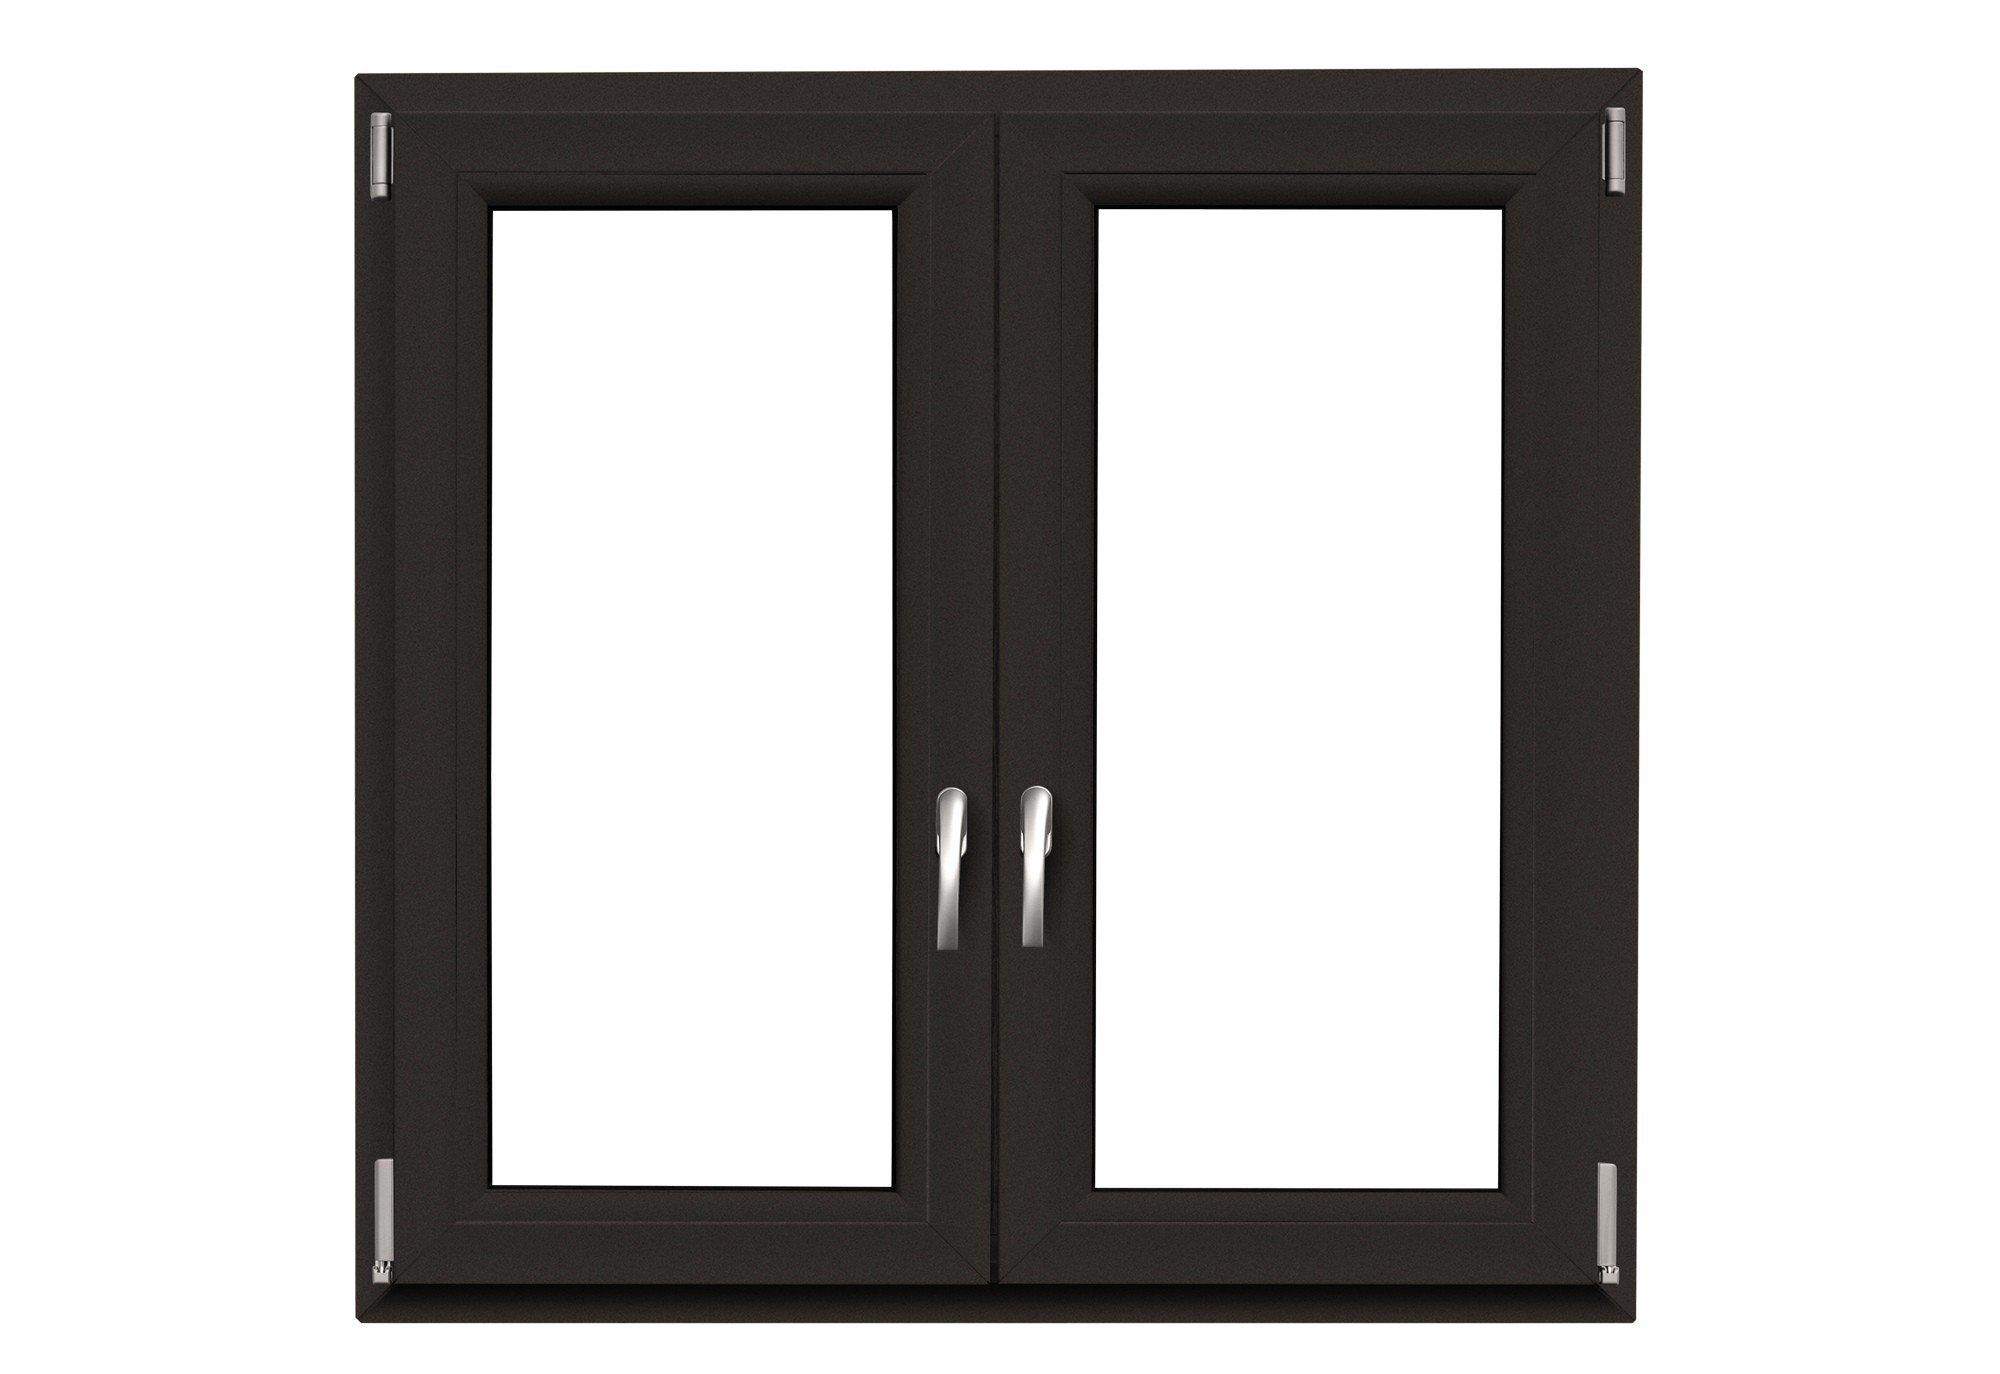 drutex s a pressroom drutex erweitert erneut. Black Bedroom Furniture Sets. Home Design Ideas